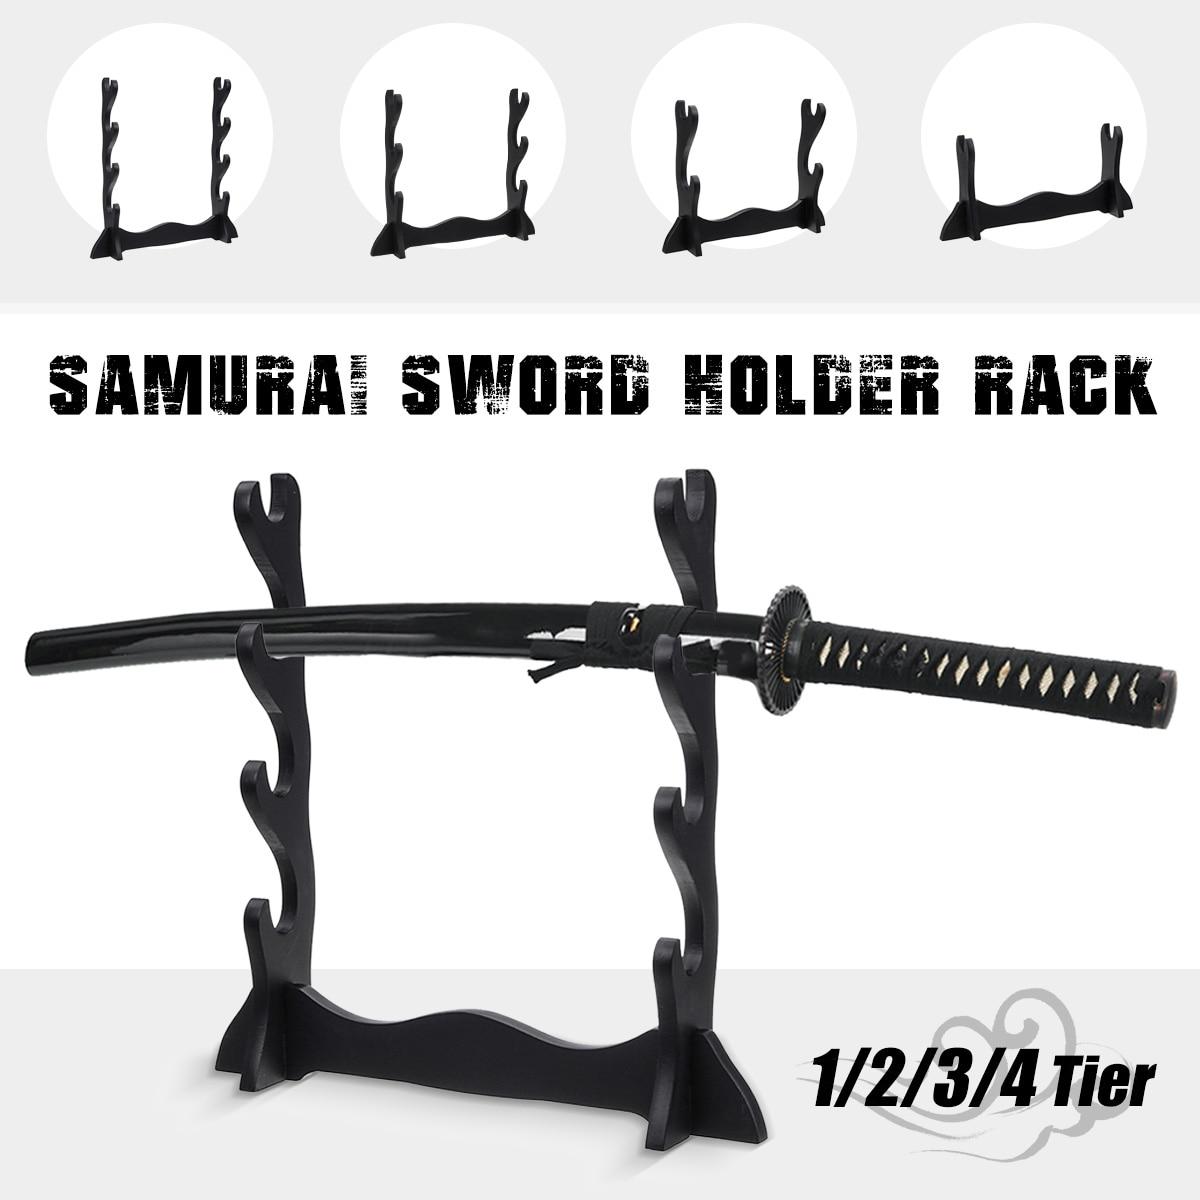 Wall-mounted 1/2/3/4-Tier Samurai Sword Holder Wakizashi Katana Holder Stand Hanger Bracket Rack Display Home Decor Decoration